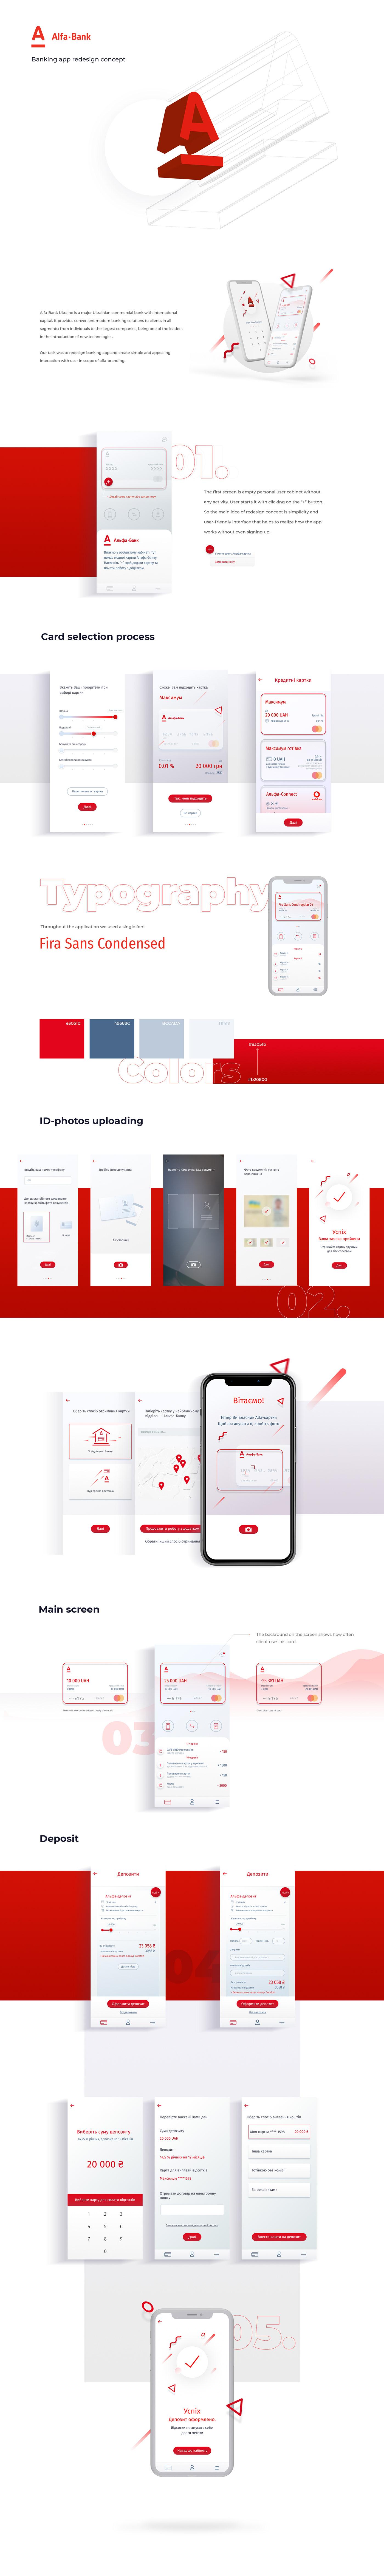 alfa-bank banking finance ui ux mobile design dashboard Bank card credit